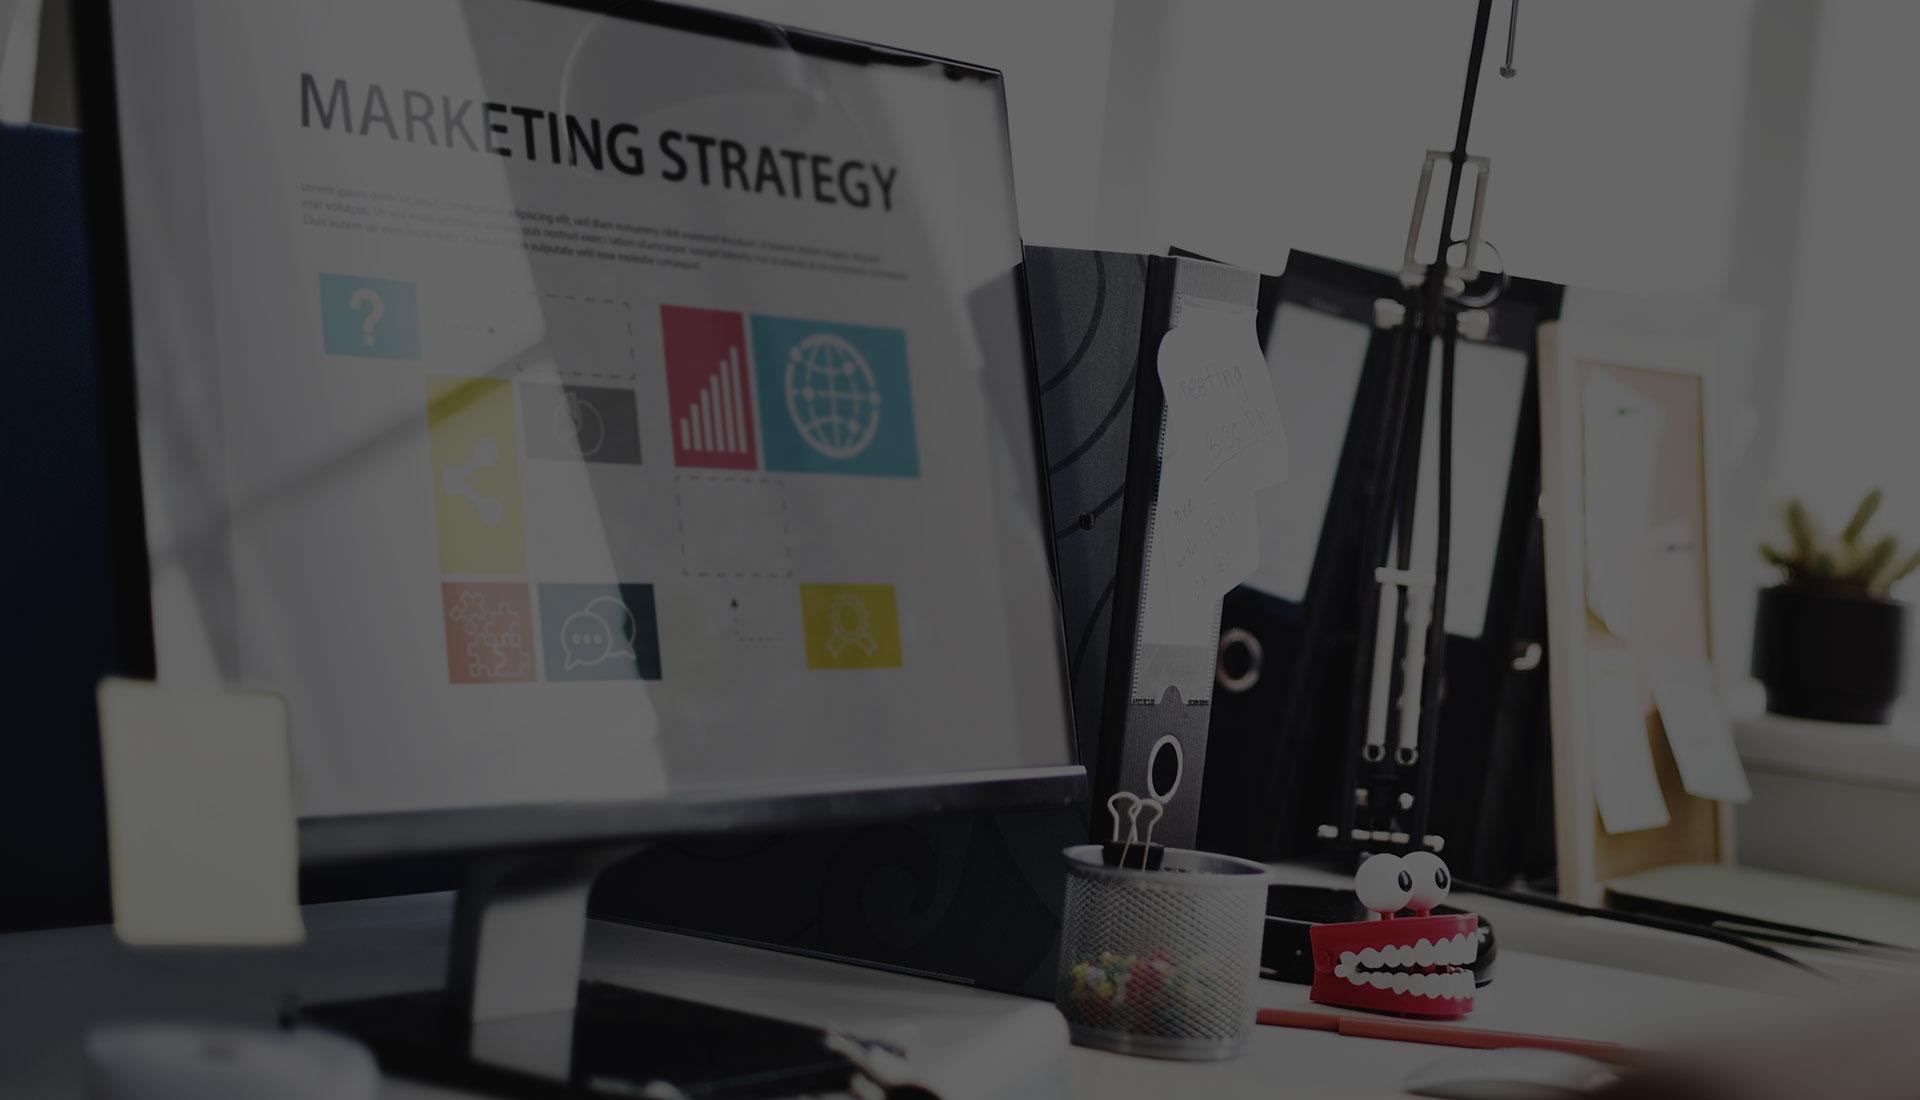 استراتيجيات تسويقية